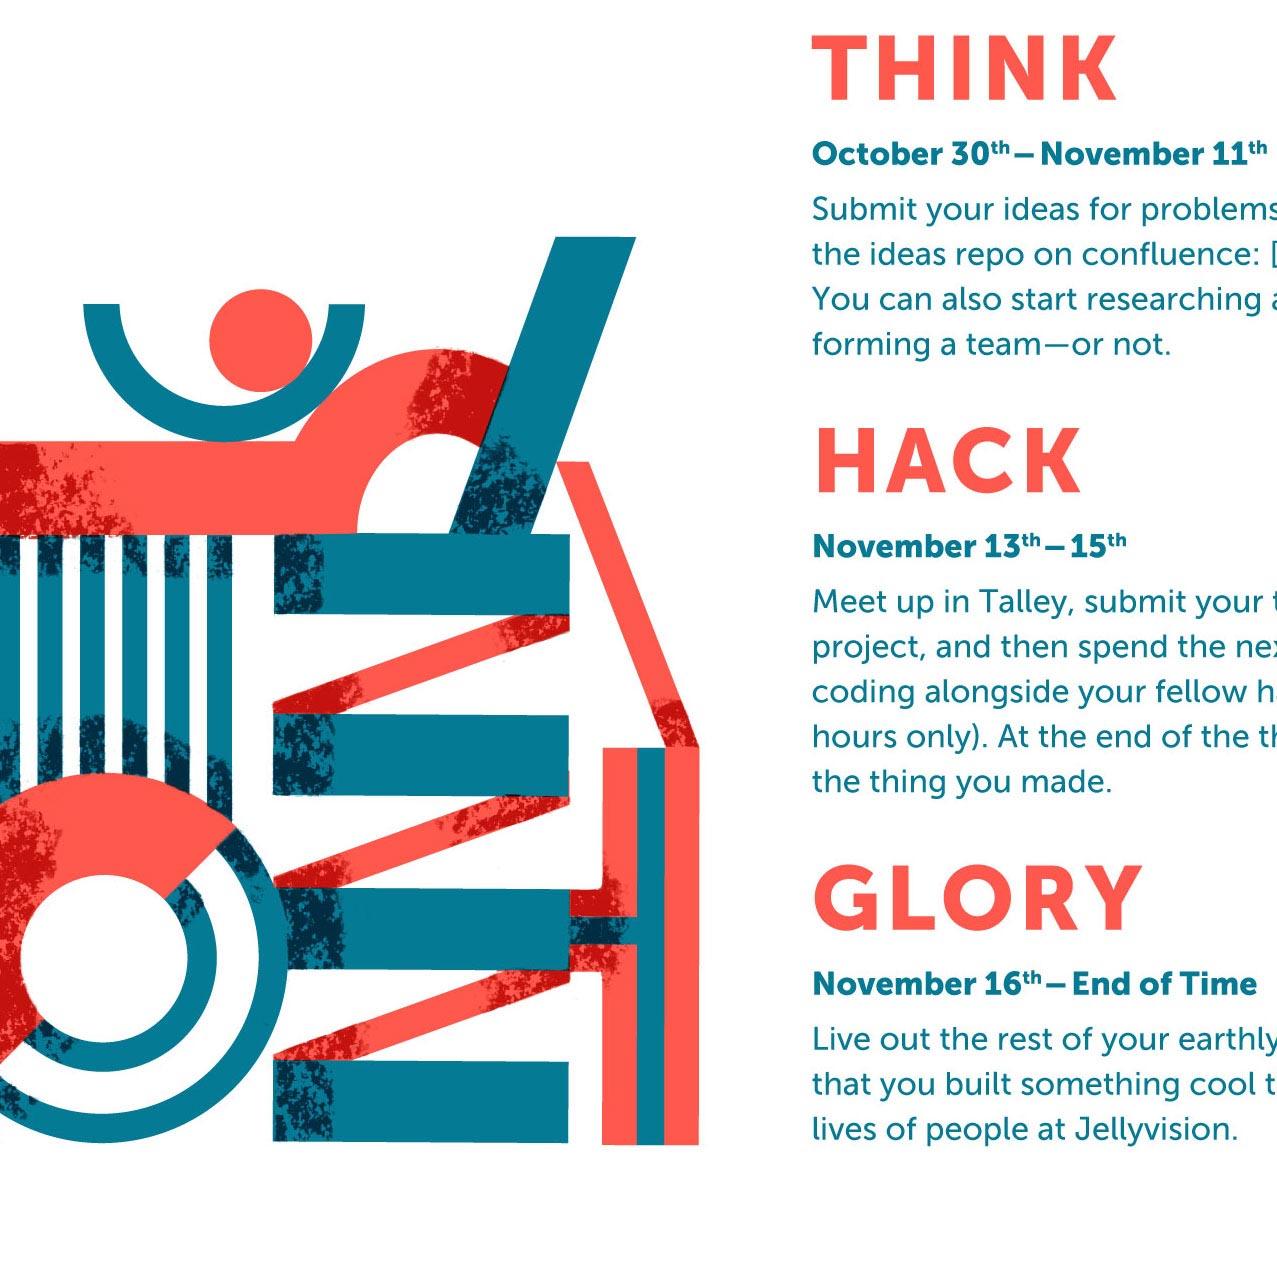 Hackathon-Poster-Detail